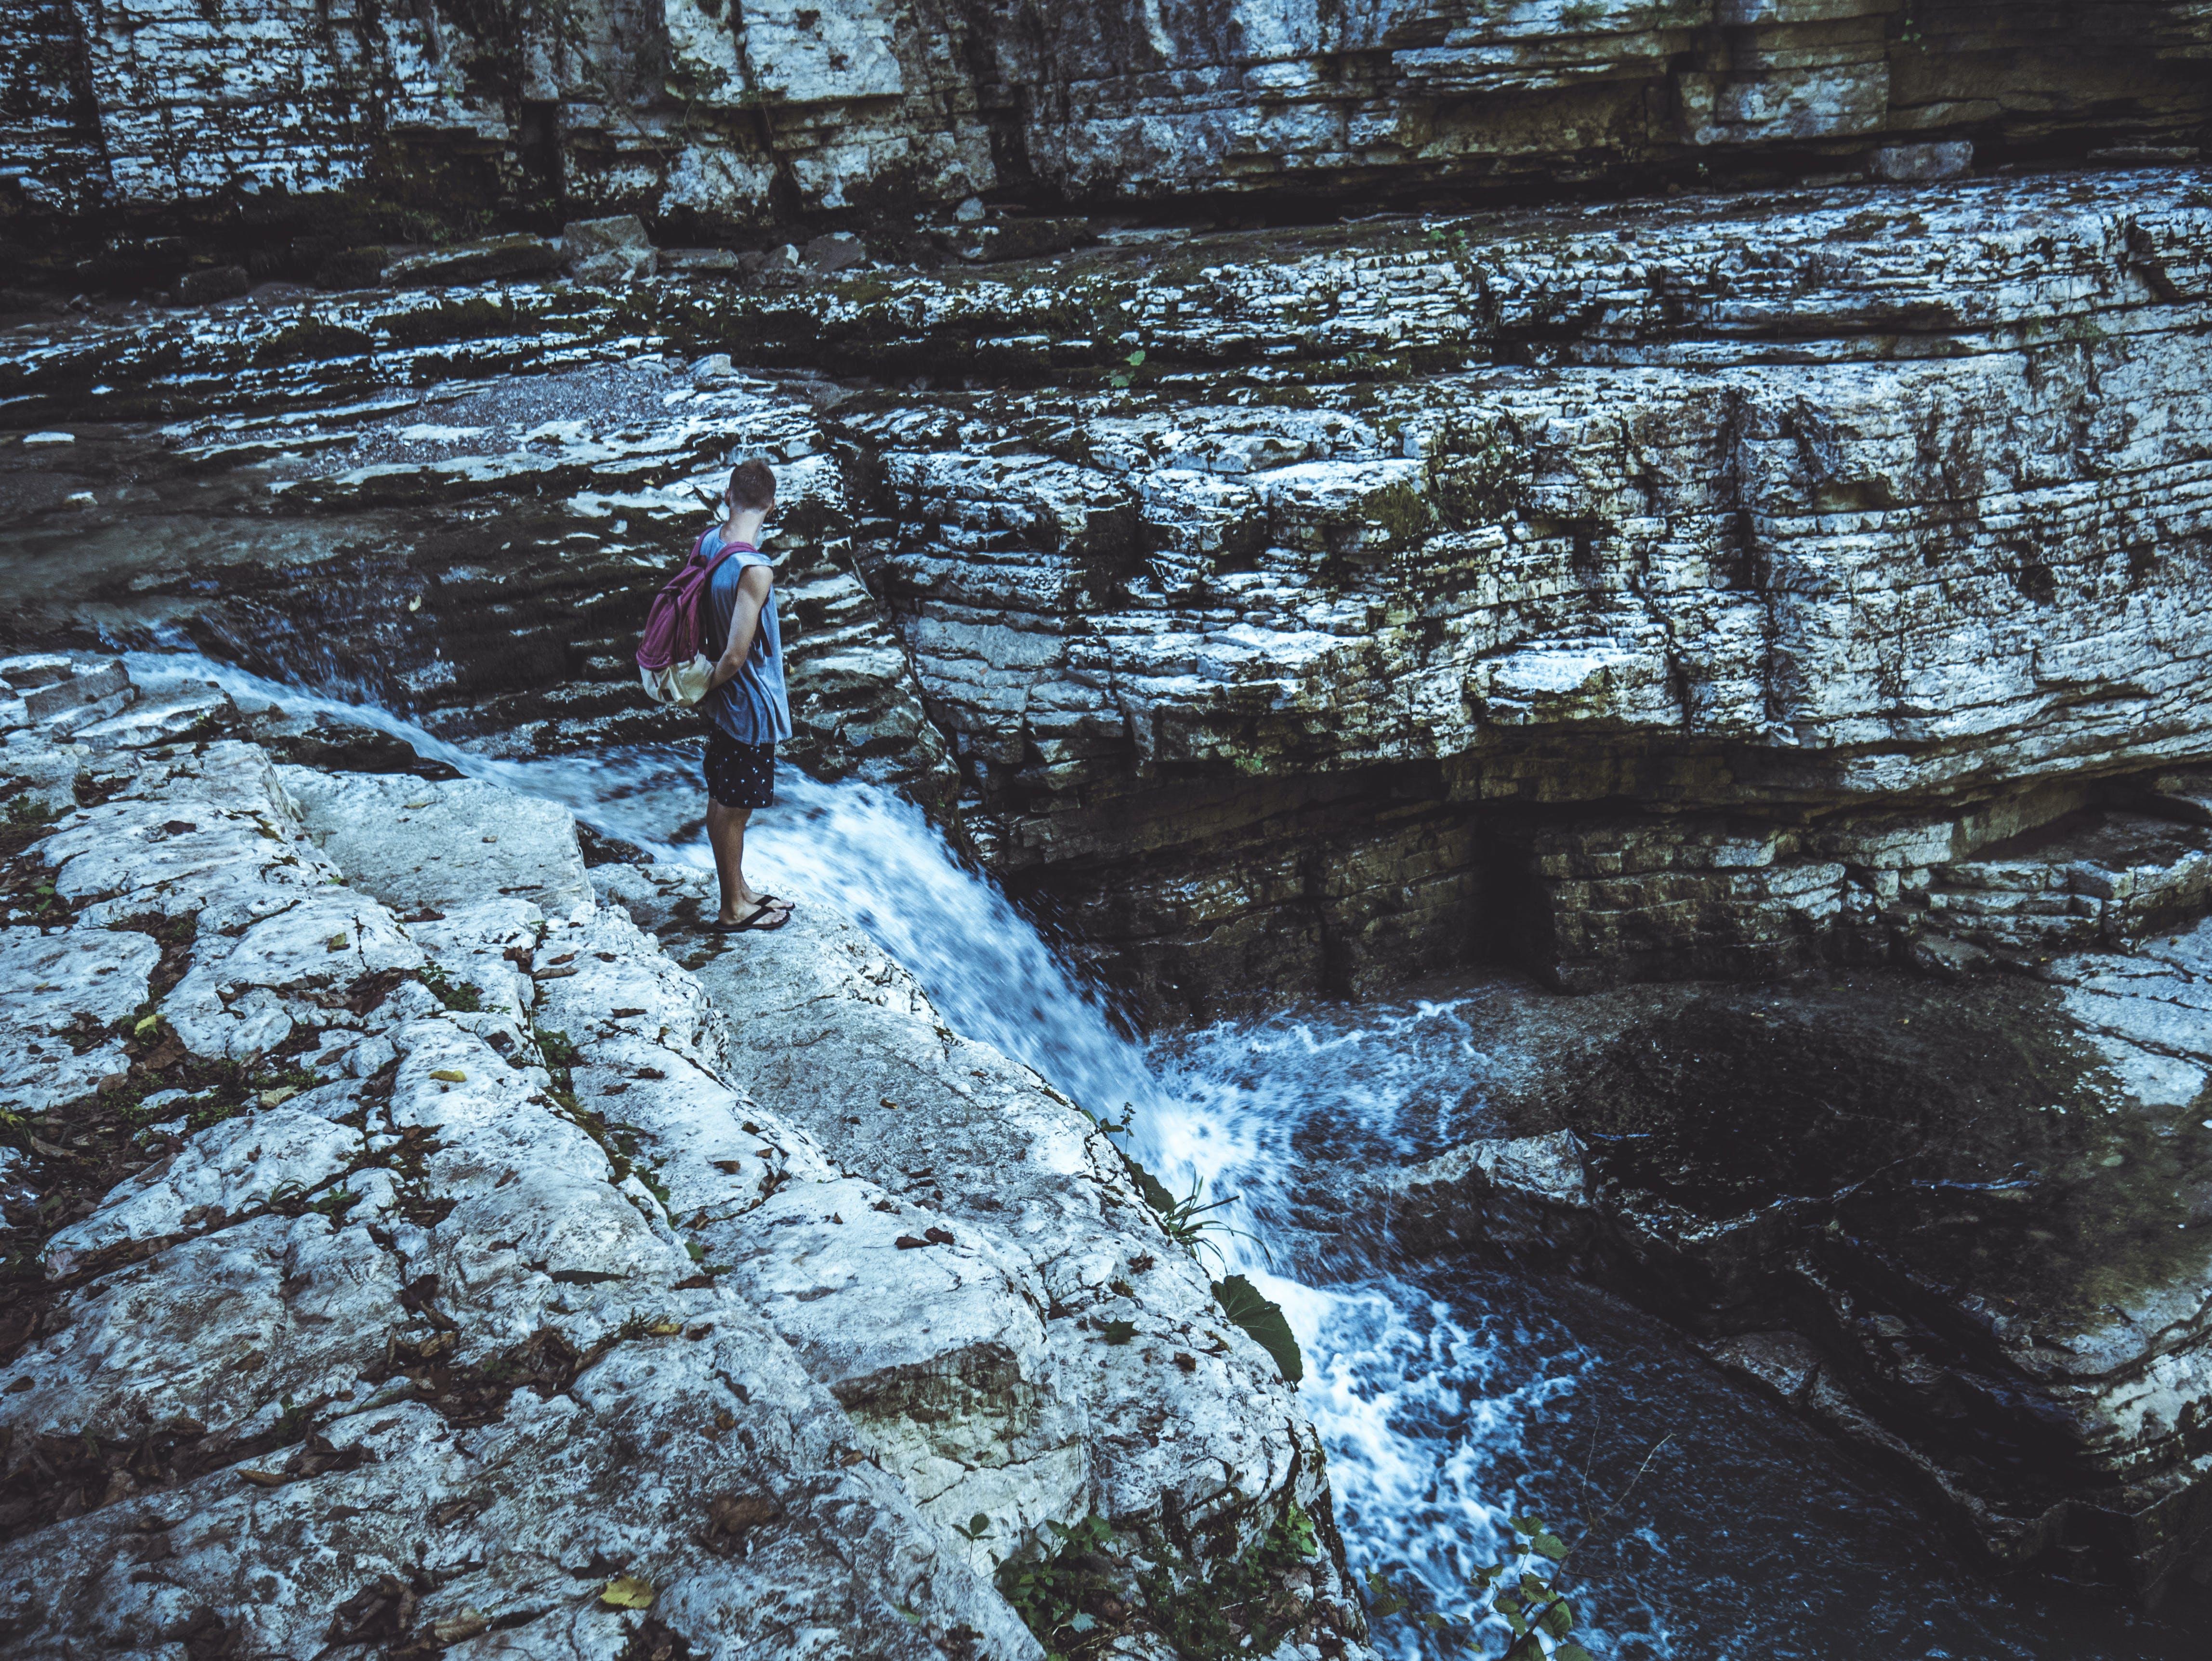 Man Standing in Waterfalls